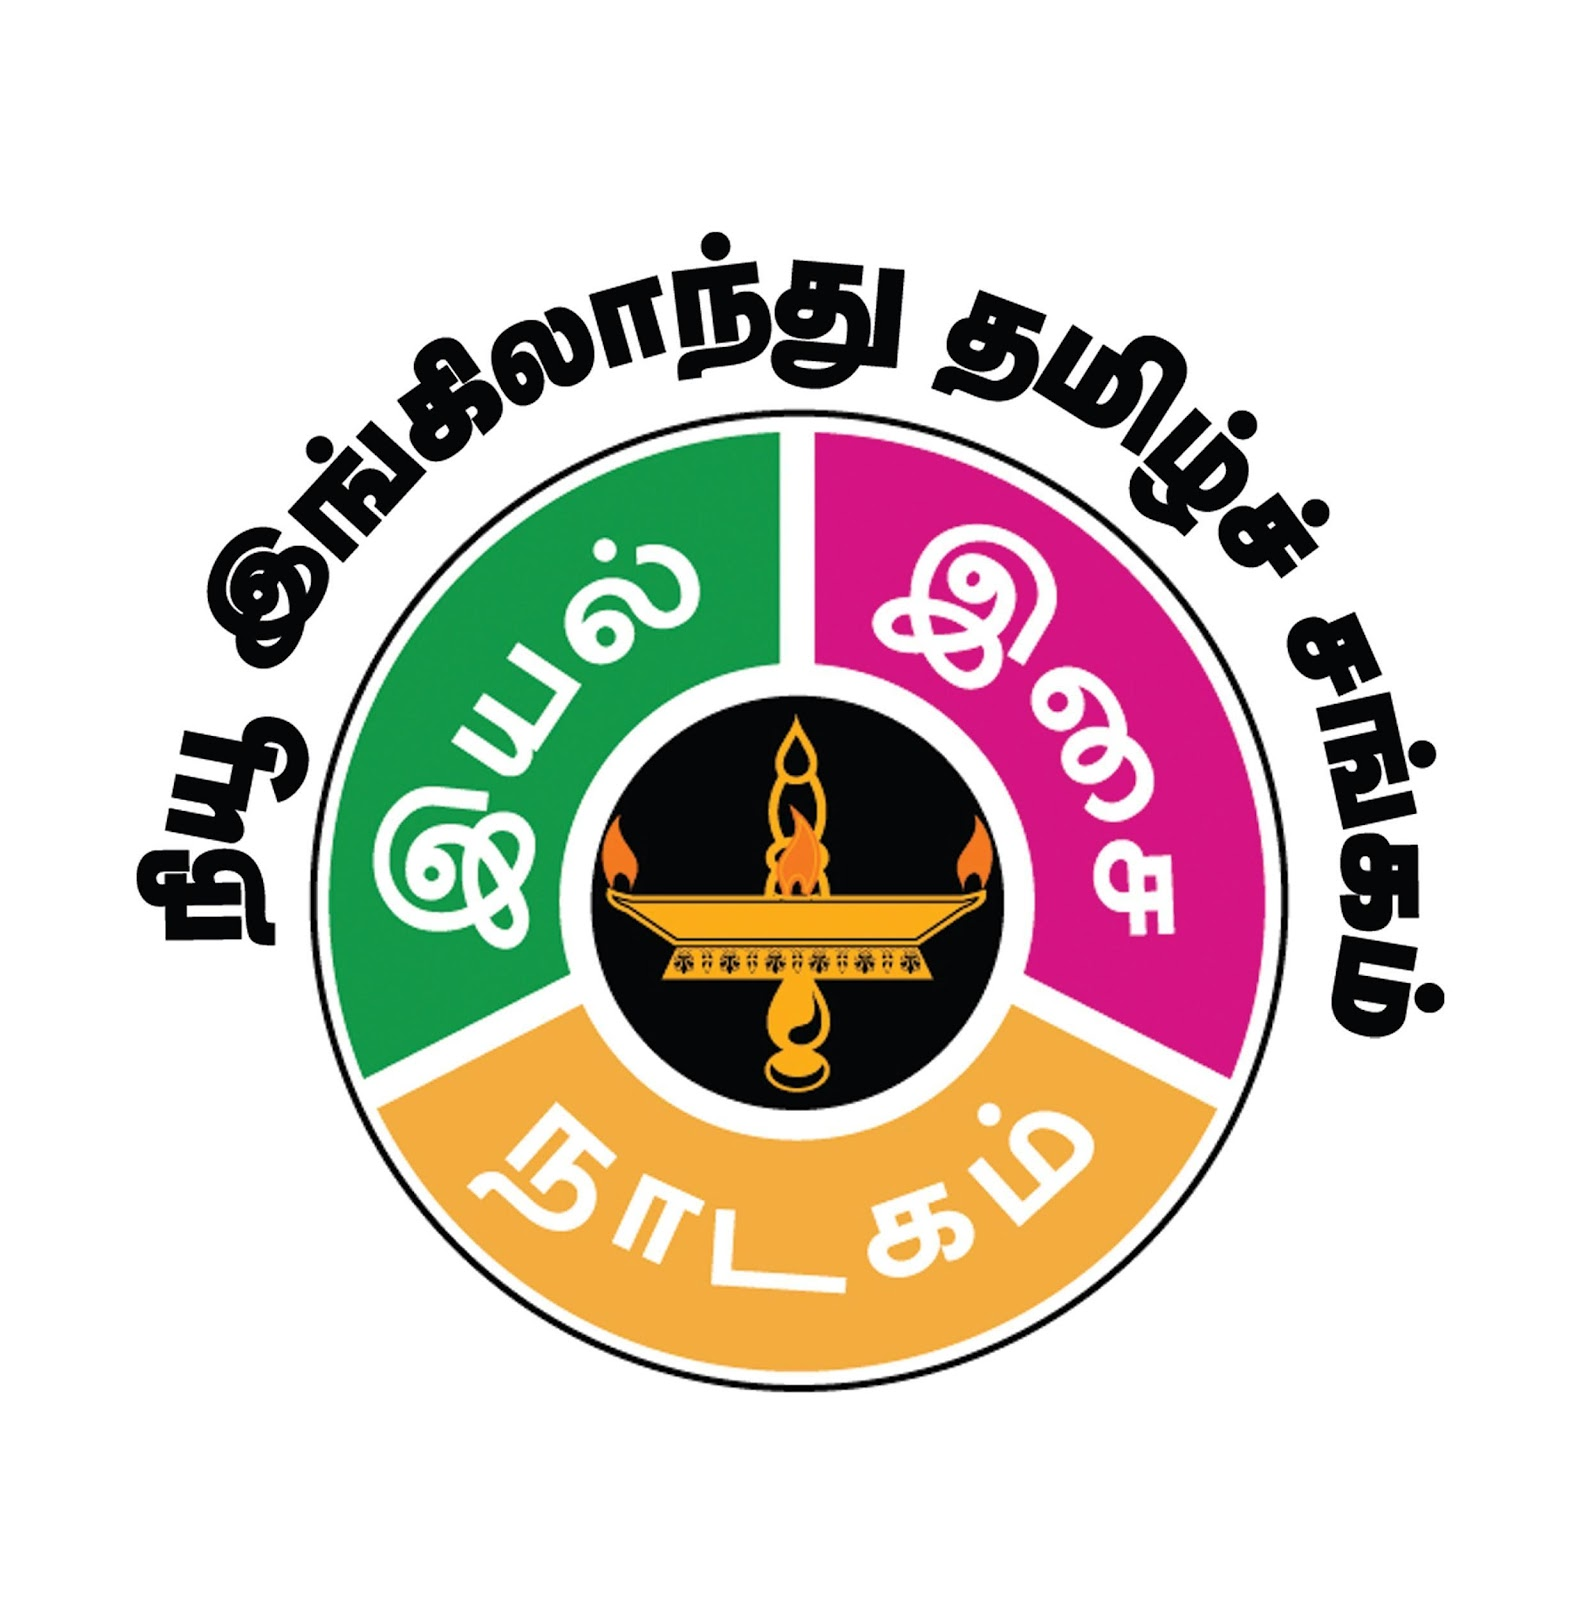 logo_1nos copy (1).jpg